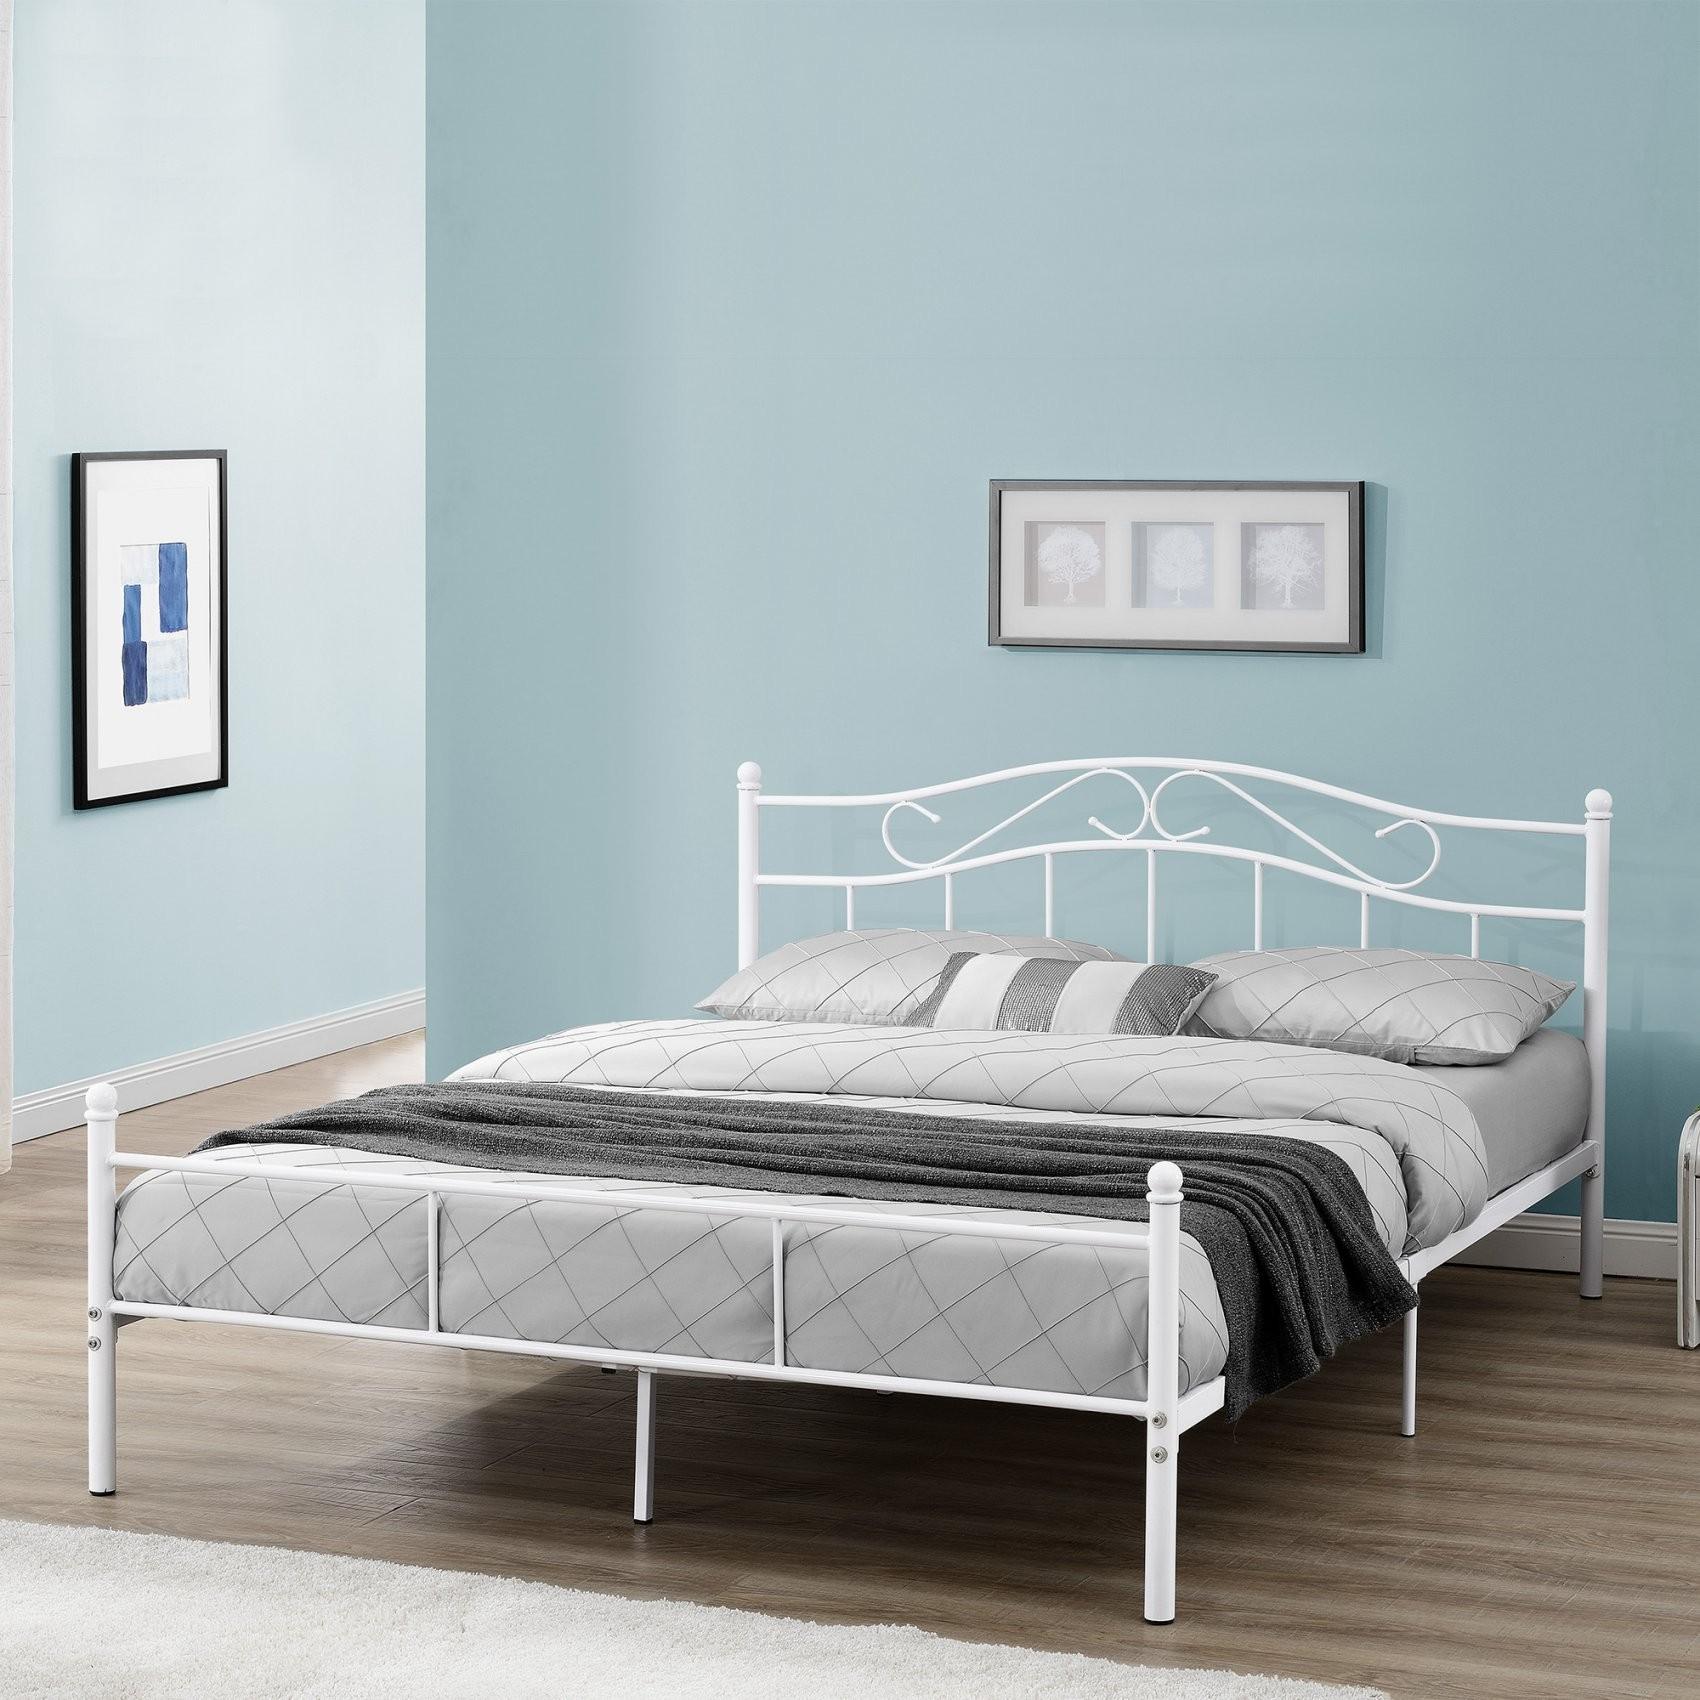 Encasa]® Metallbett 90120140180200X200 Bett Bettgestell von Bettgestell Metall 140X200 Bild